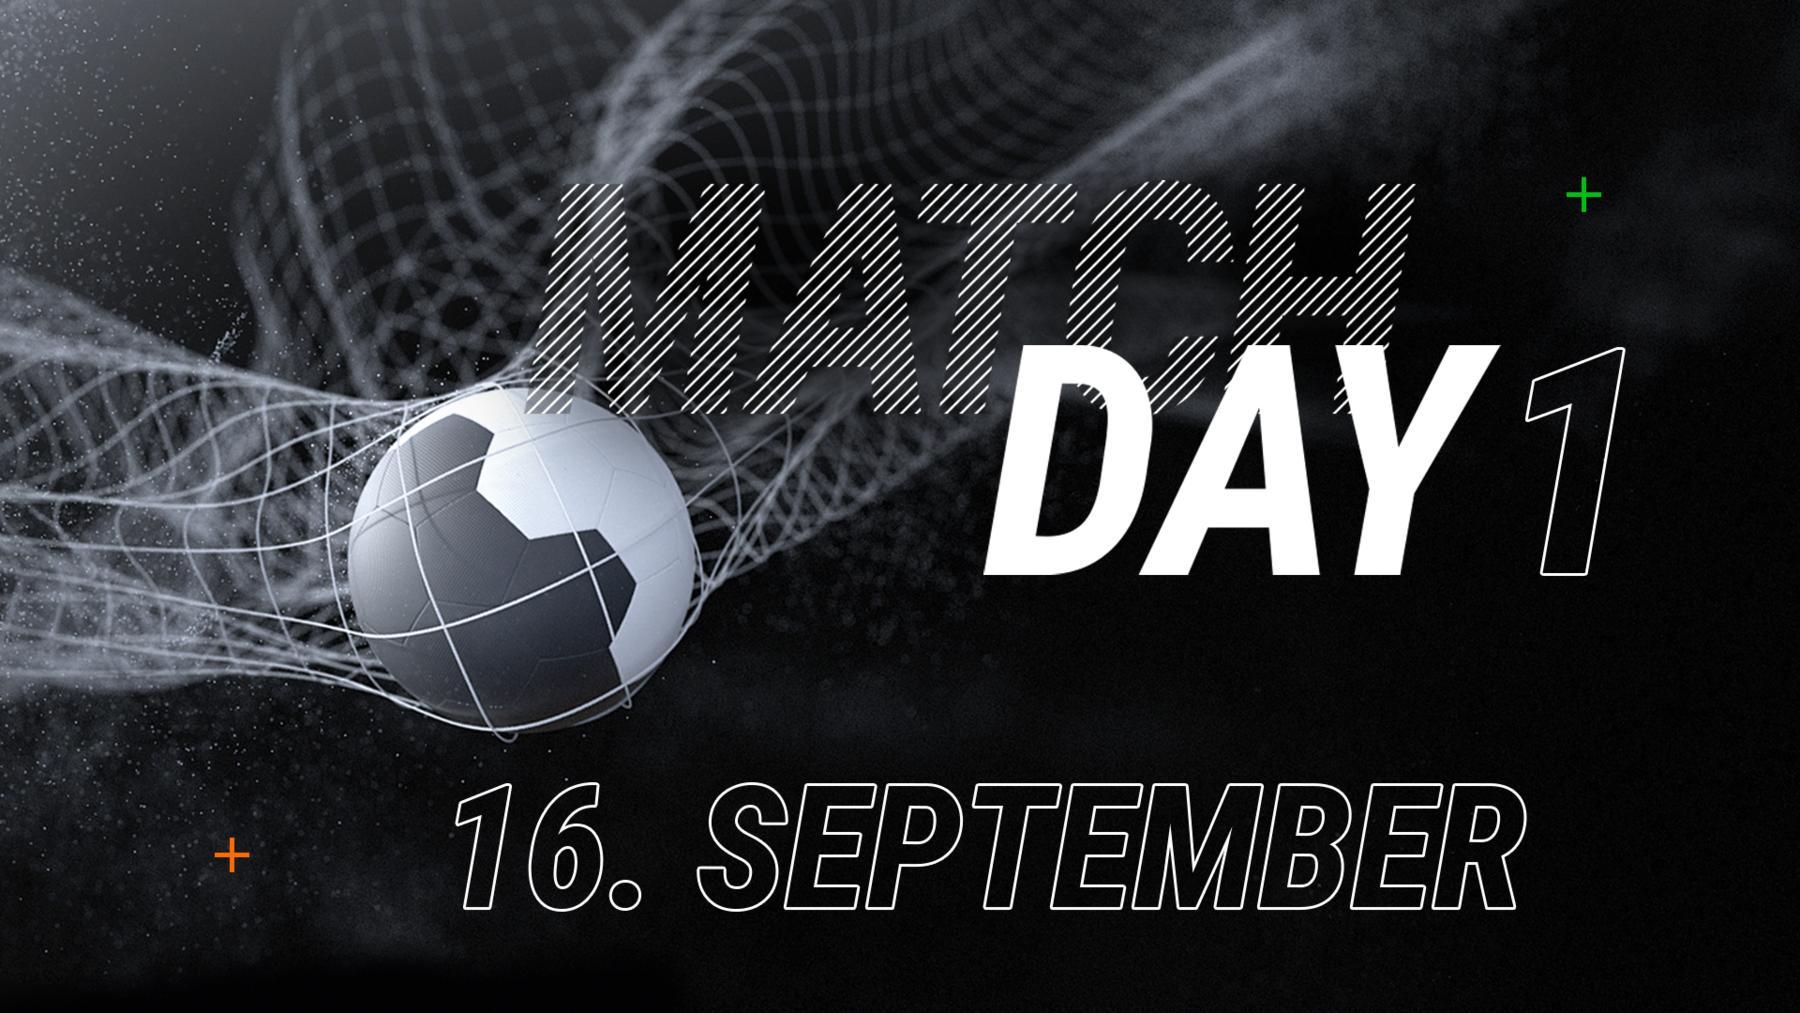 1. Spieltag - 16. September